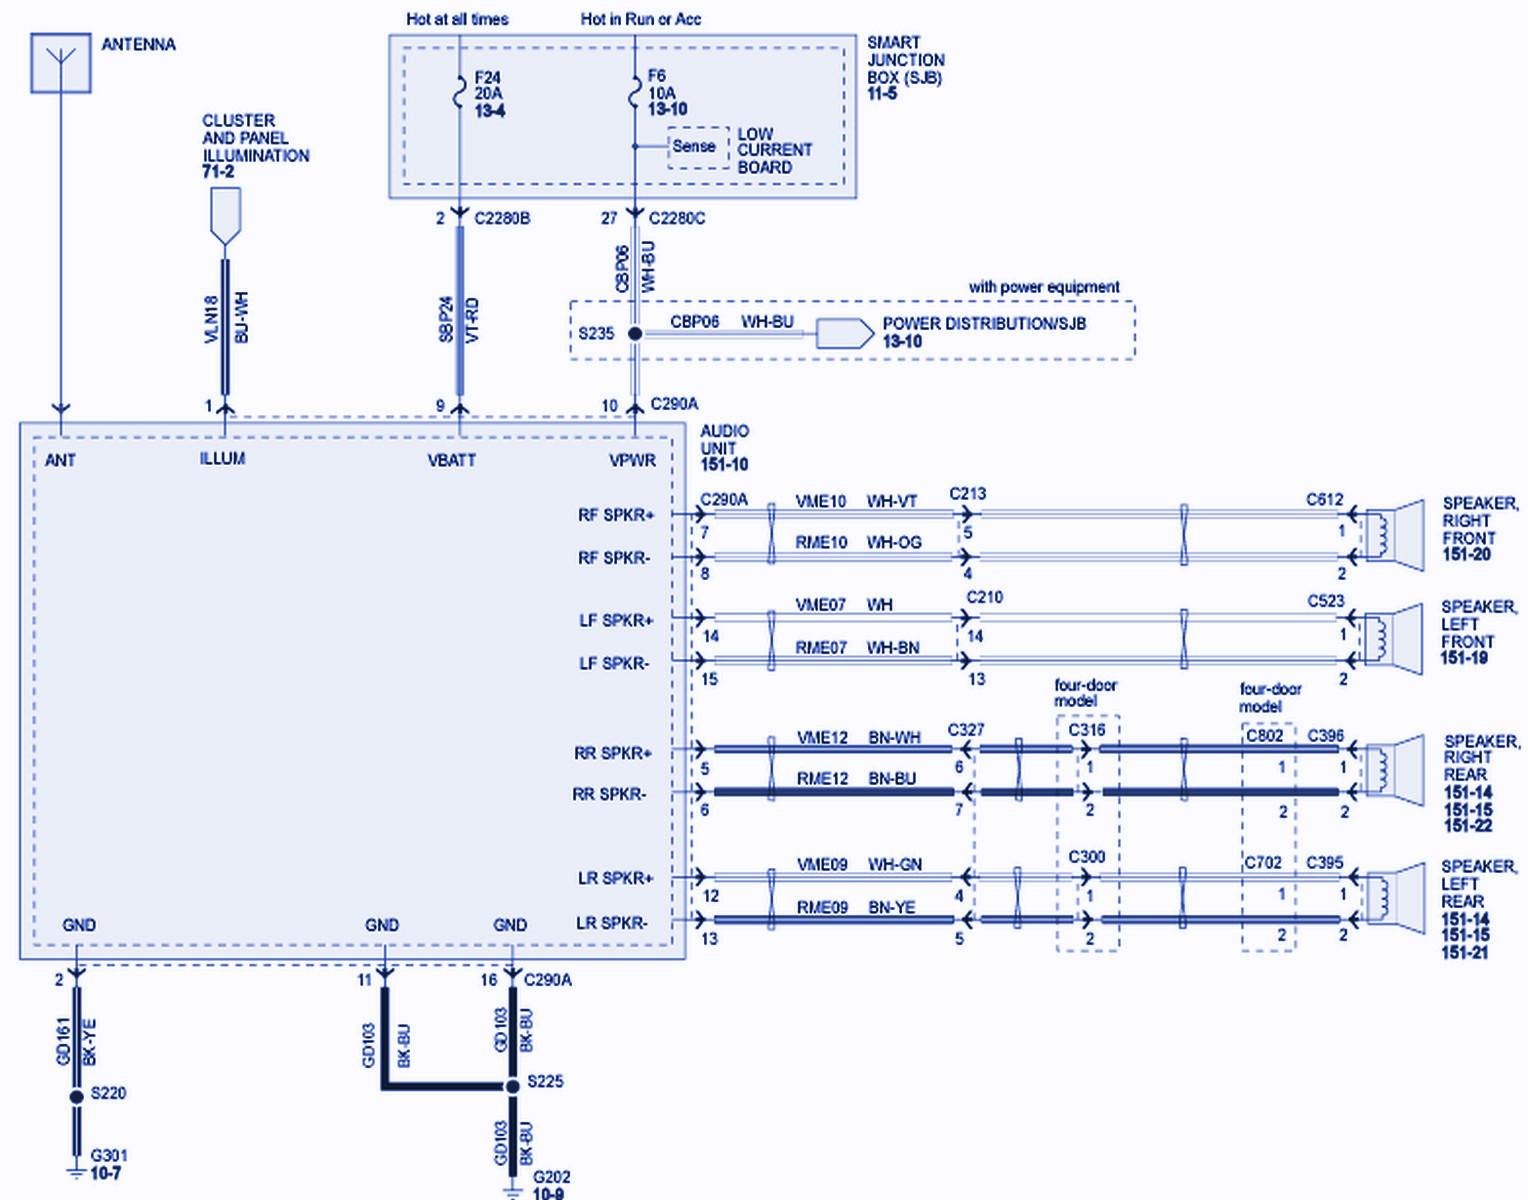 Radio Wiring Harness Diagram For 94 Ranger - Wiring Diagram couple -  couple.fotootticamezzolo.it